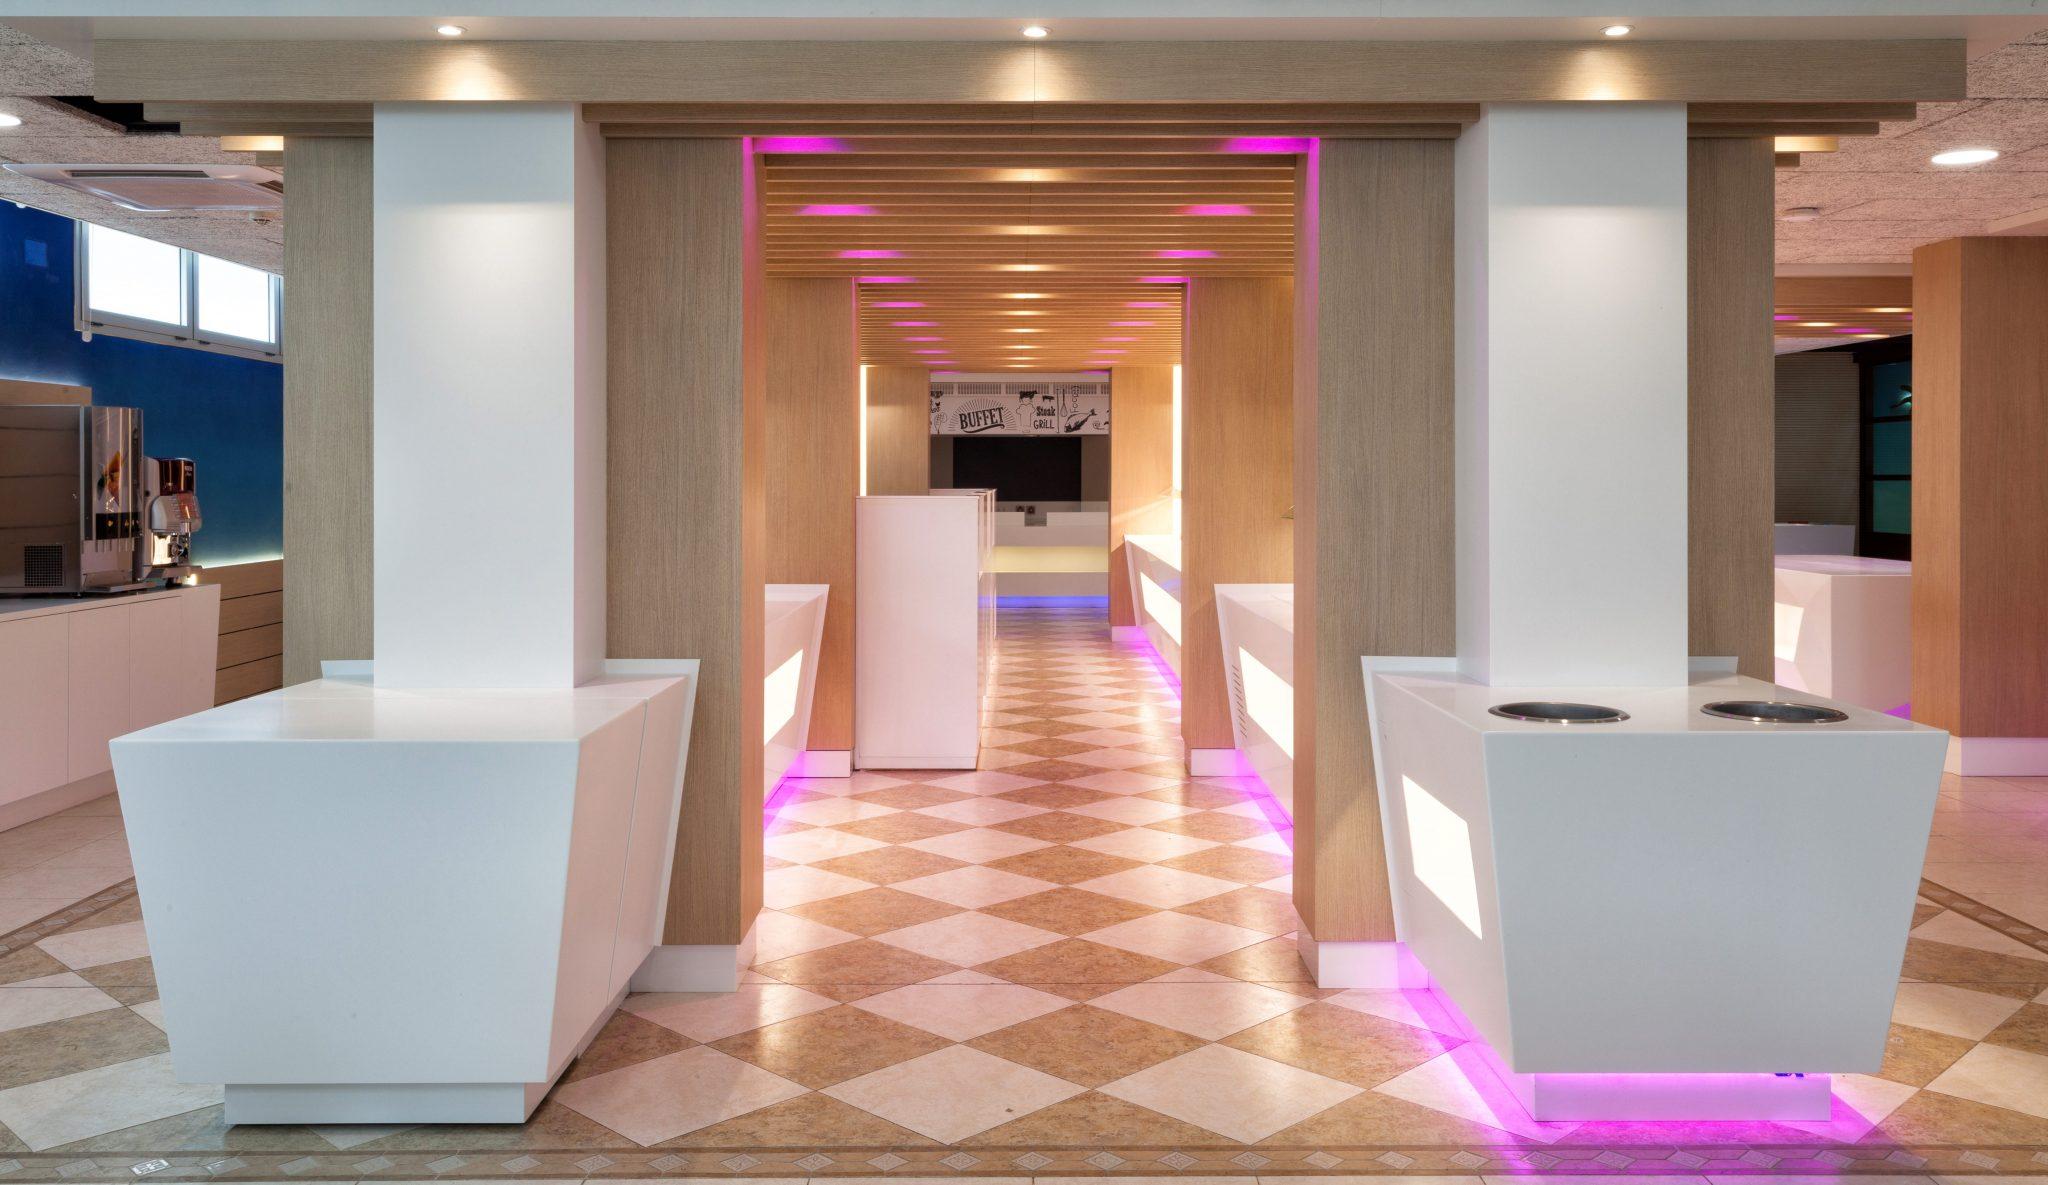 Hotel Montemar Maritim Santa Susana Barcelona by Rosa Colet Design